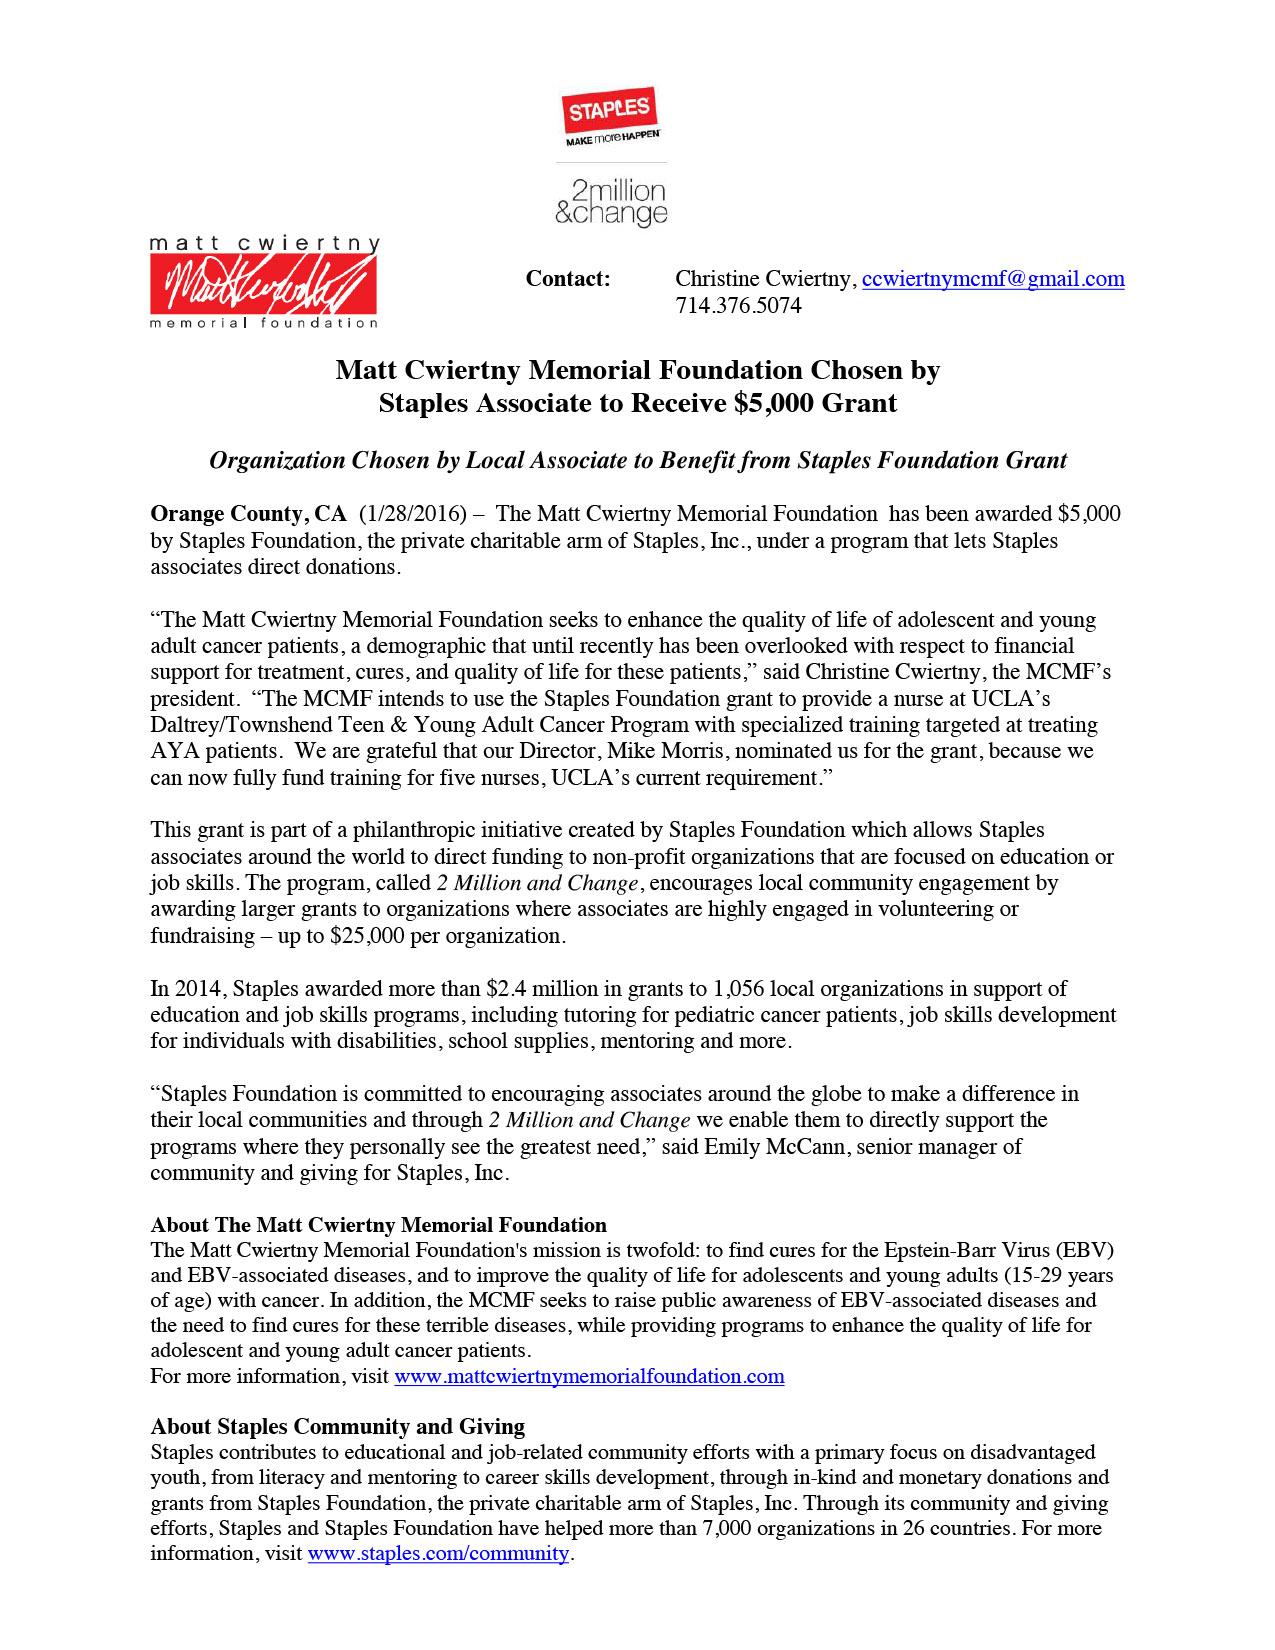 2016 Staples Foundation Grant to MCMF-c.jpg